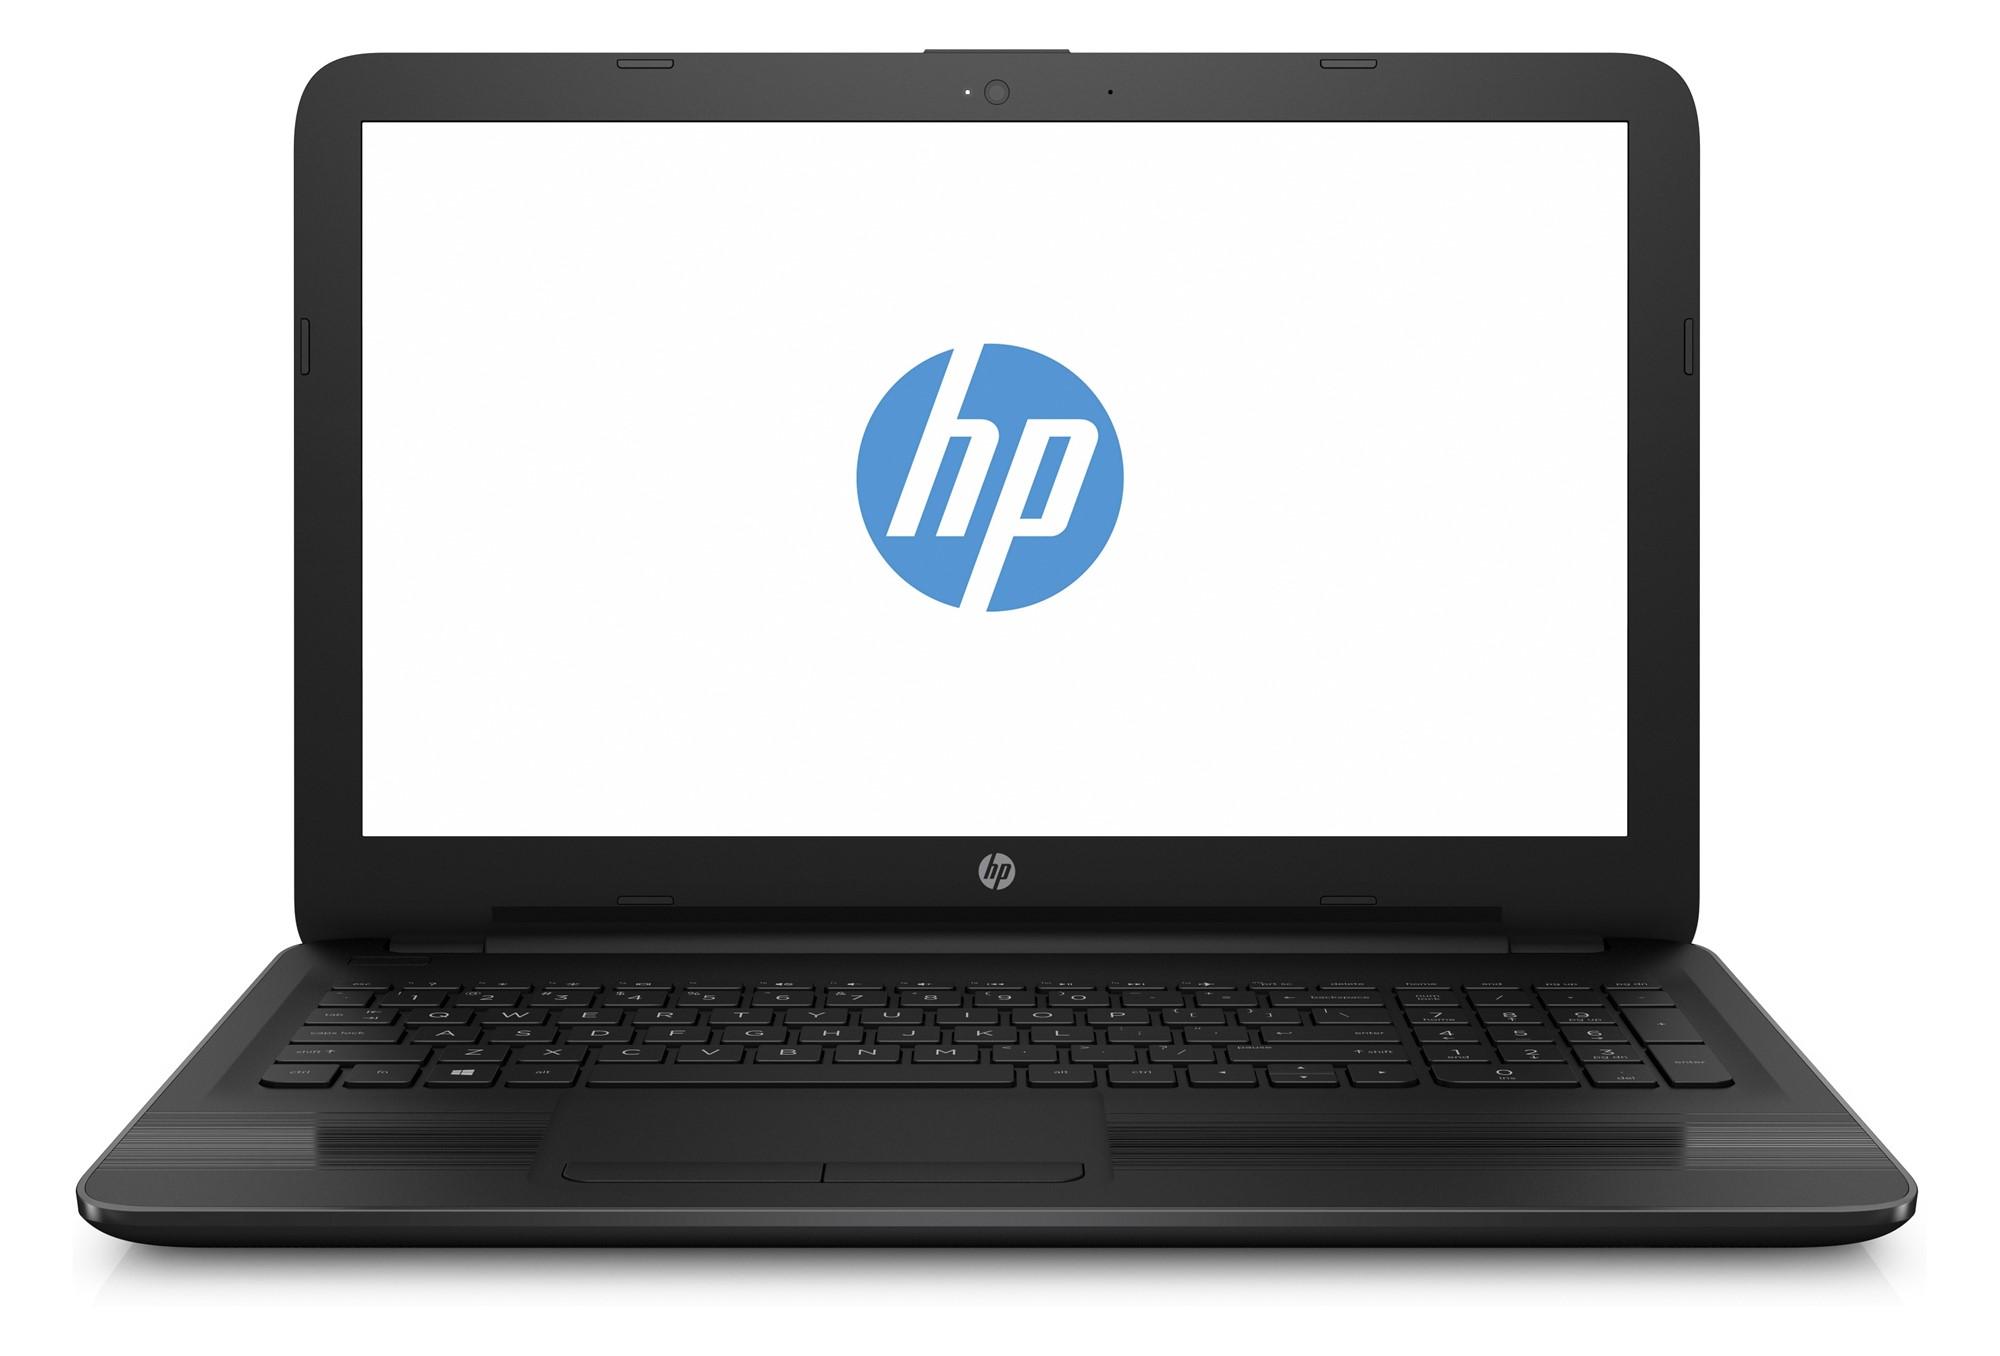 "Laptop HP 15-BA009 AMD A6, RAM 4GB, Disco Duro 500GB, Pantalla 15.6"", DVD-RW, Windows 10, REFURBISH"